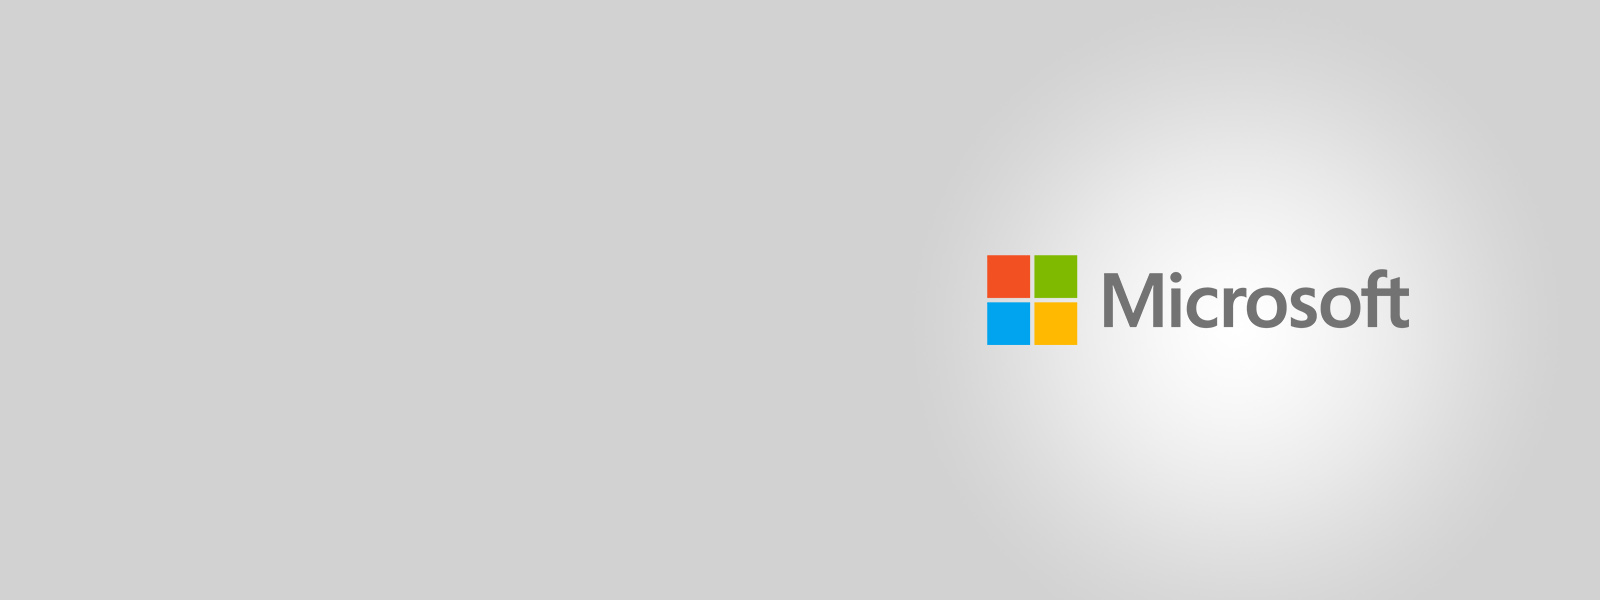 Microsoft's board adopts board tenure policy